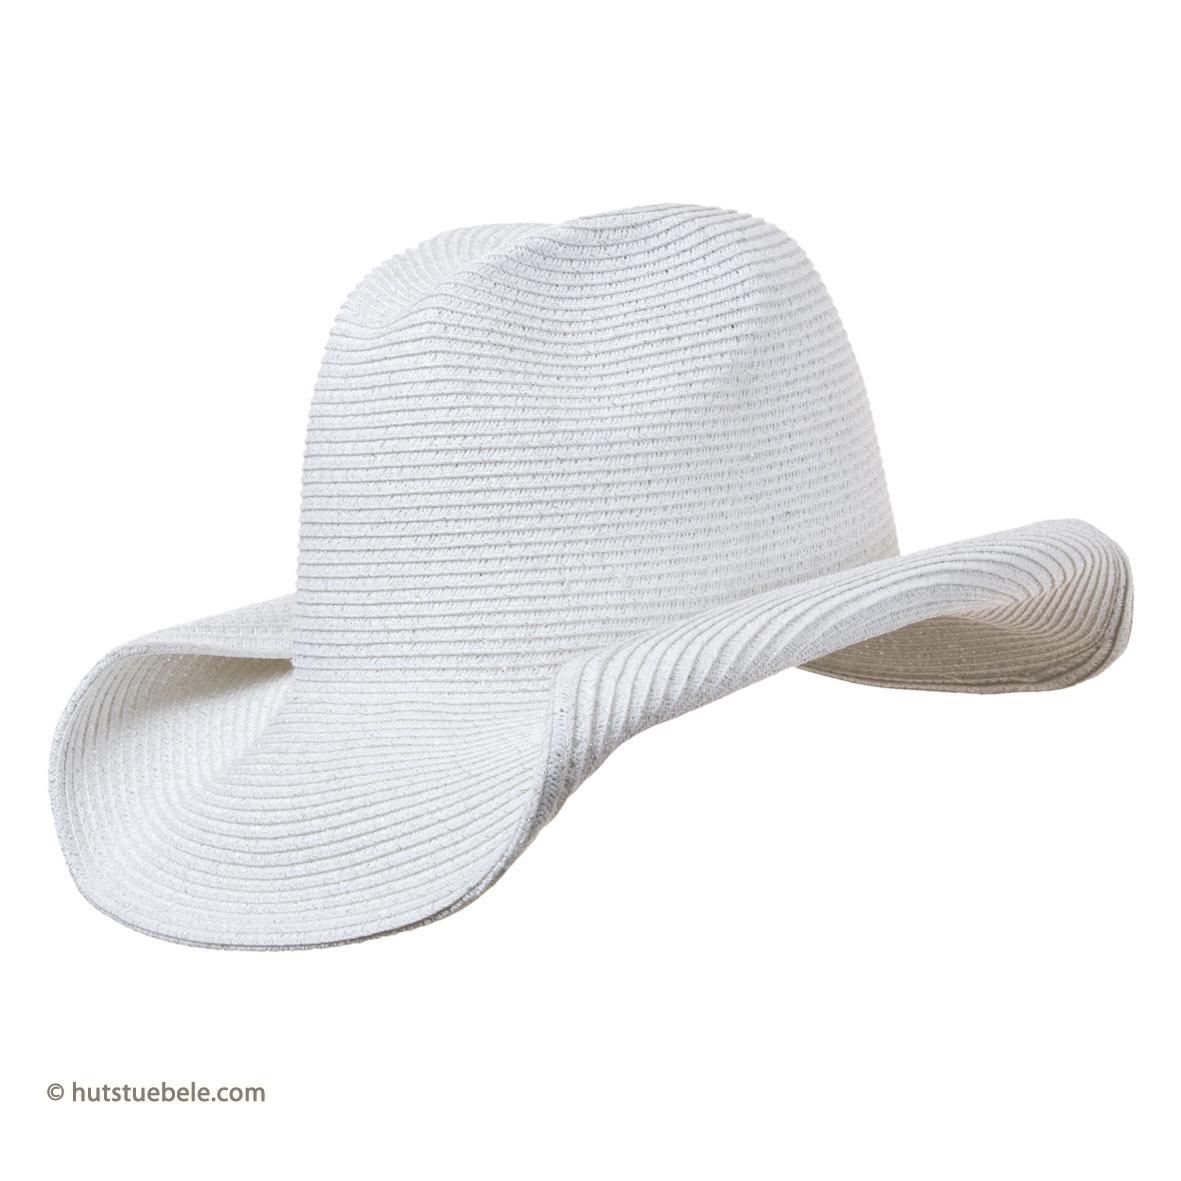 Cappello affascinate di stile cowboy da donna by HUTTER ... 8b9d7d923375